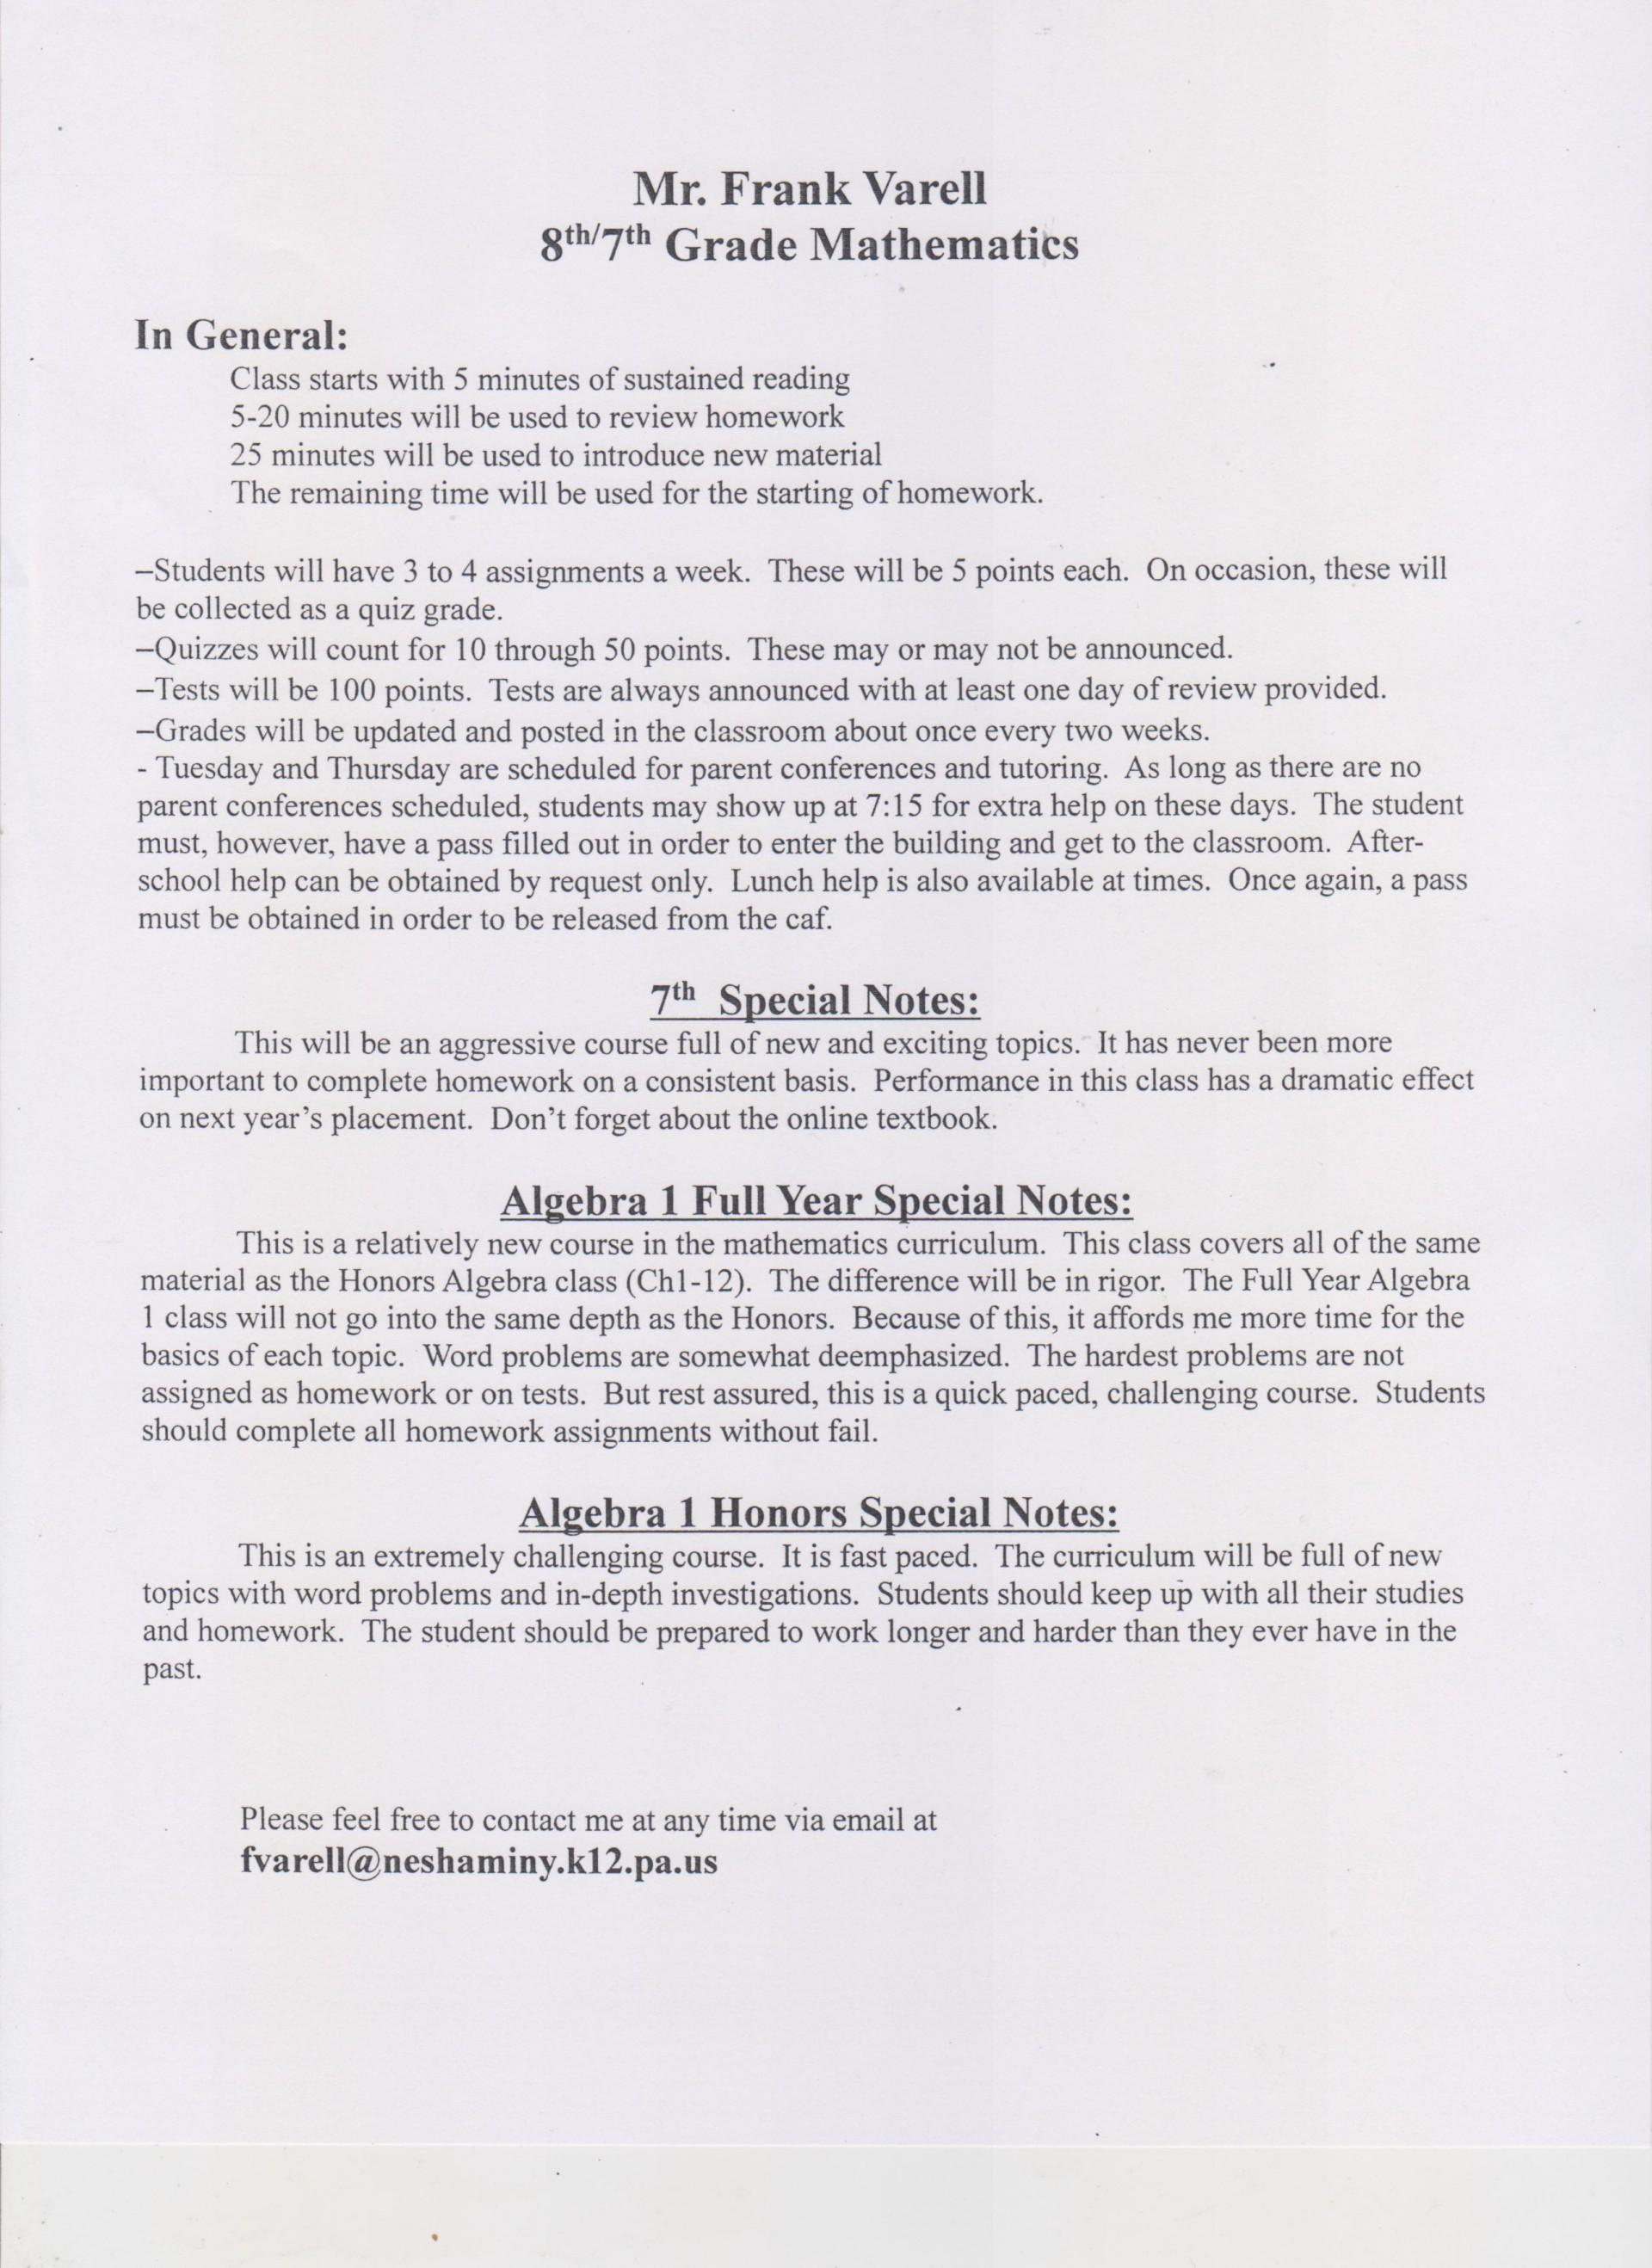 020 Essay Example Best Essays Uk Writing For Internet Norfolk Virginia Order Service Reddit Forum Law Based Reviews Stupendous New Apa Login 1920